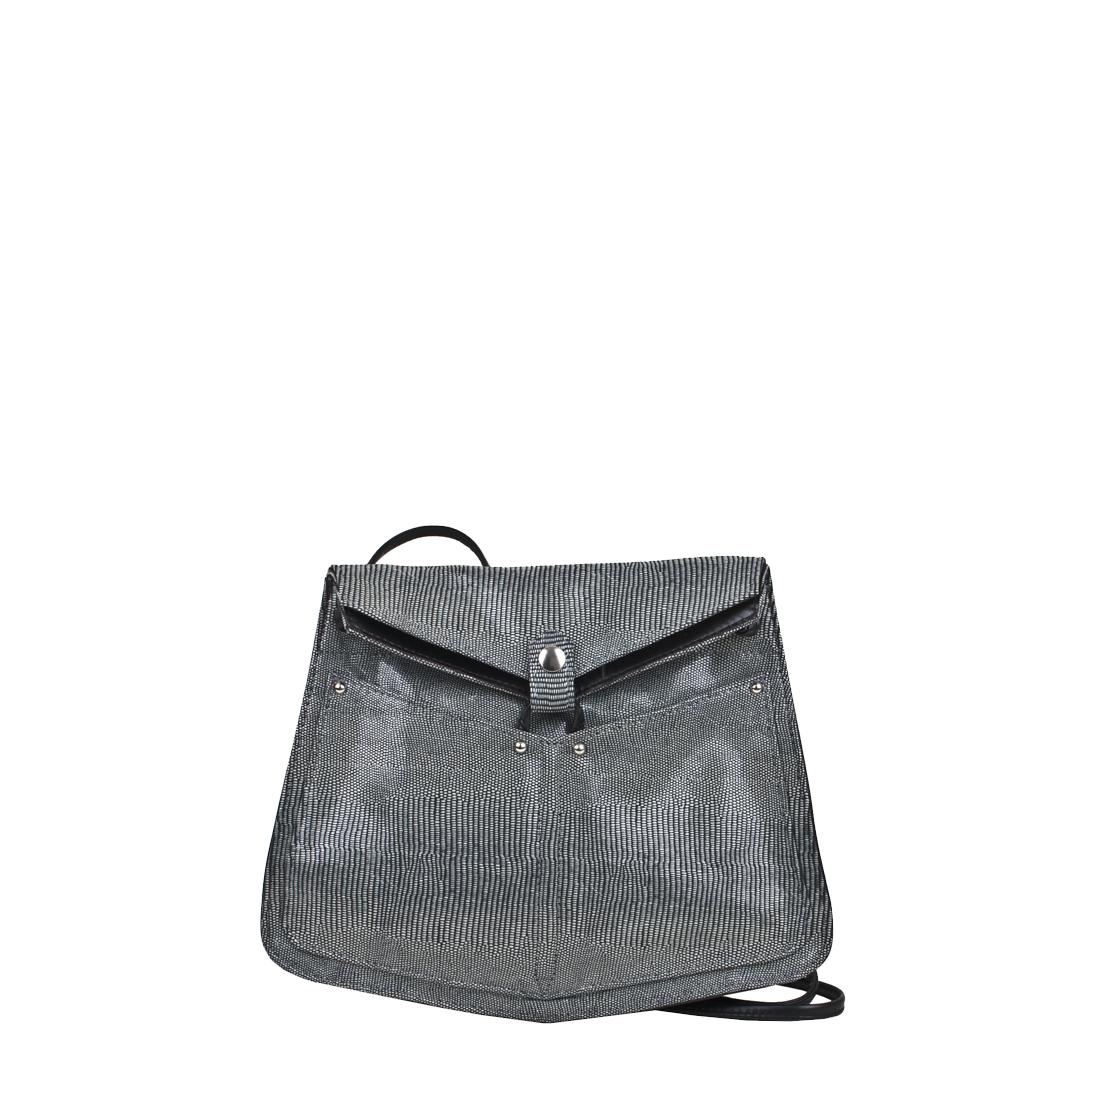 Urban Courmayeur Leather Across Body Bag